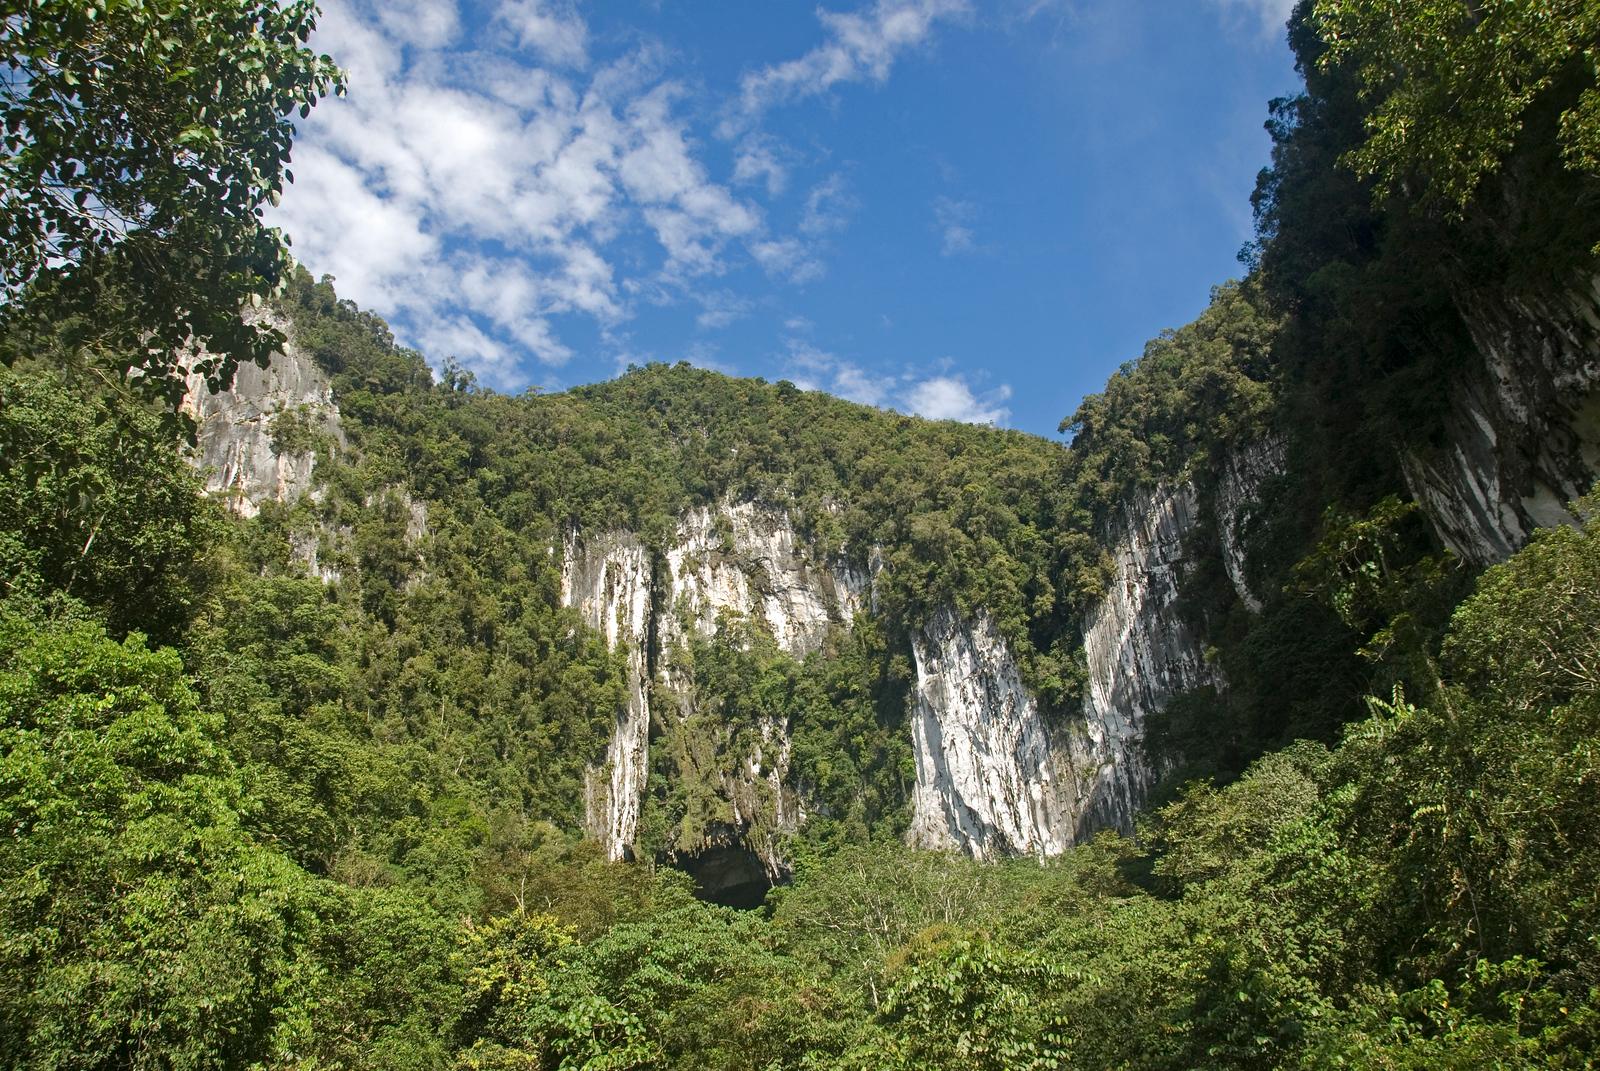 Gunung Mulu National Park - UNESCO World Heritage Site